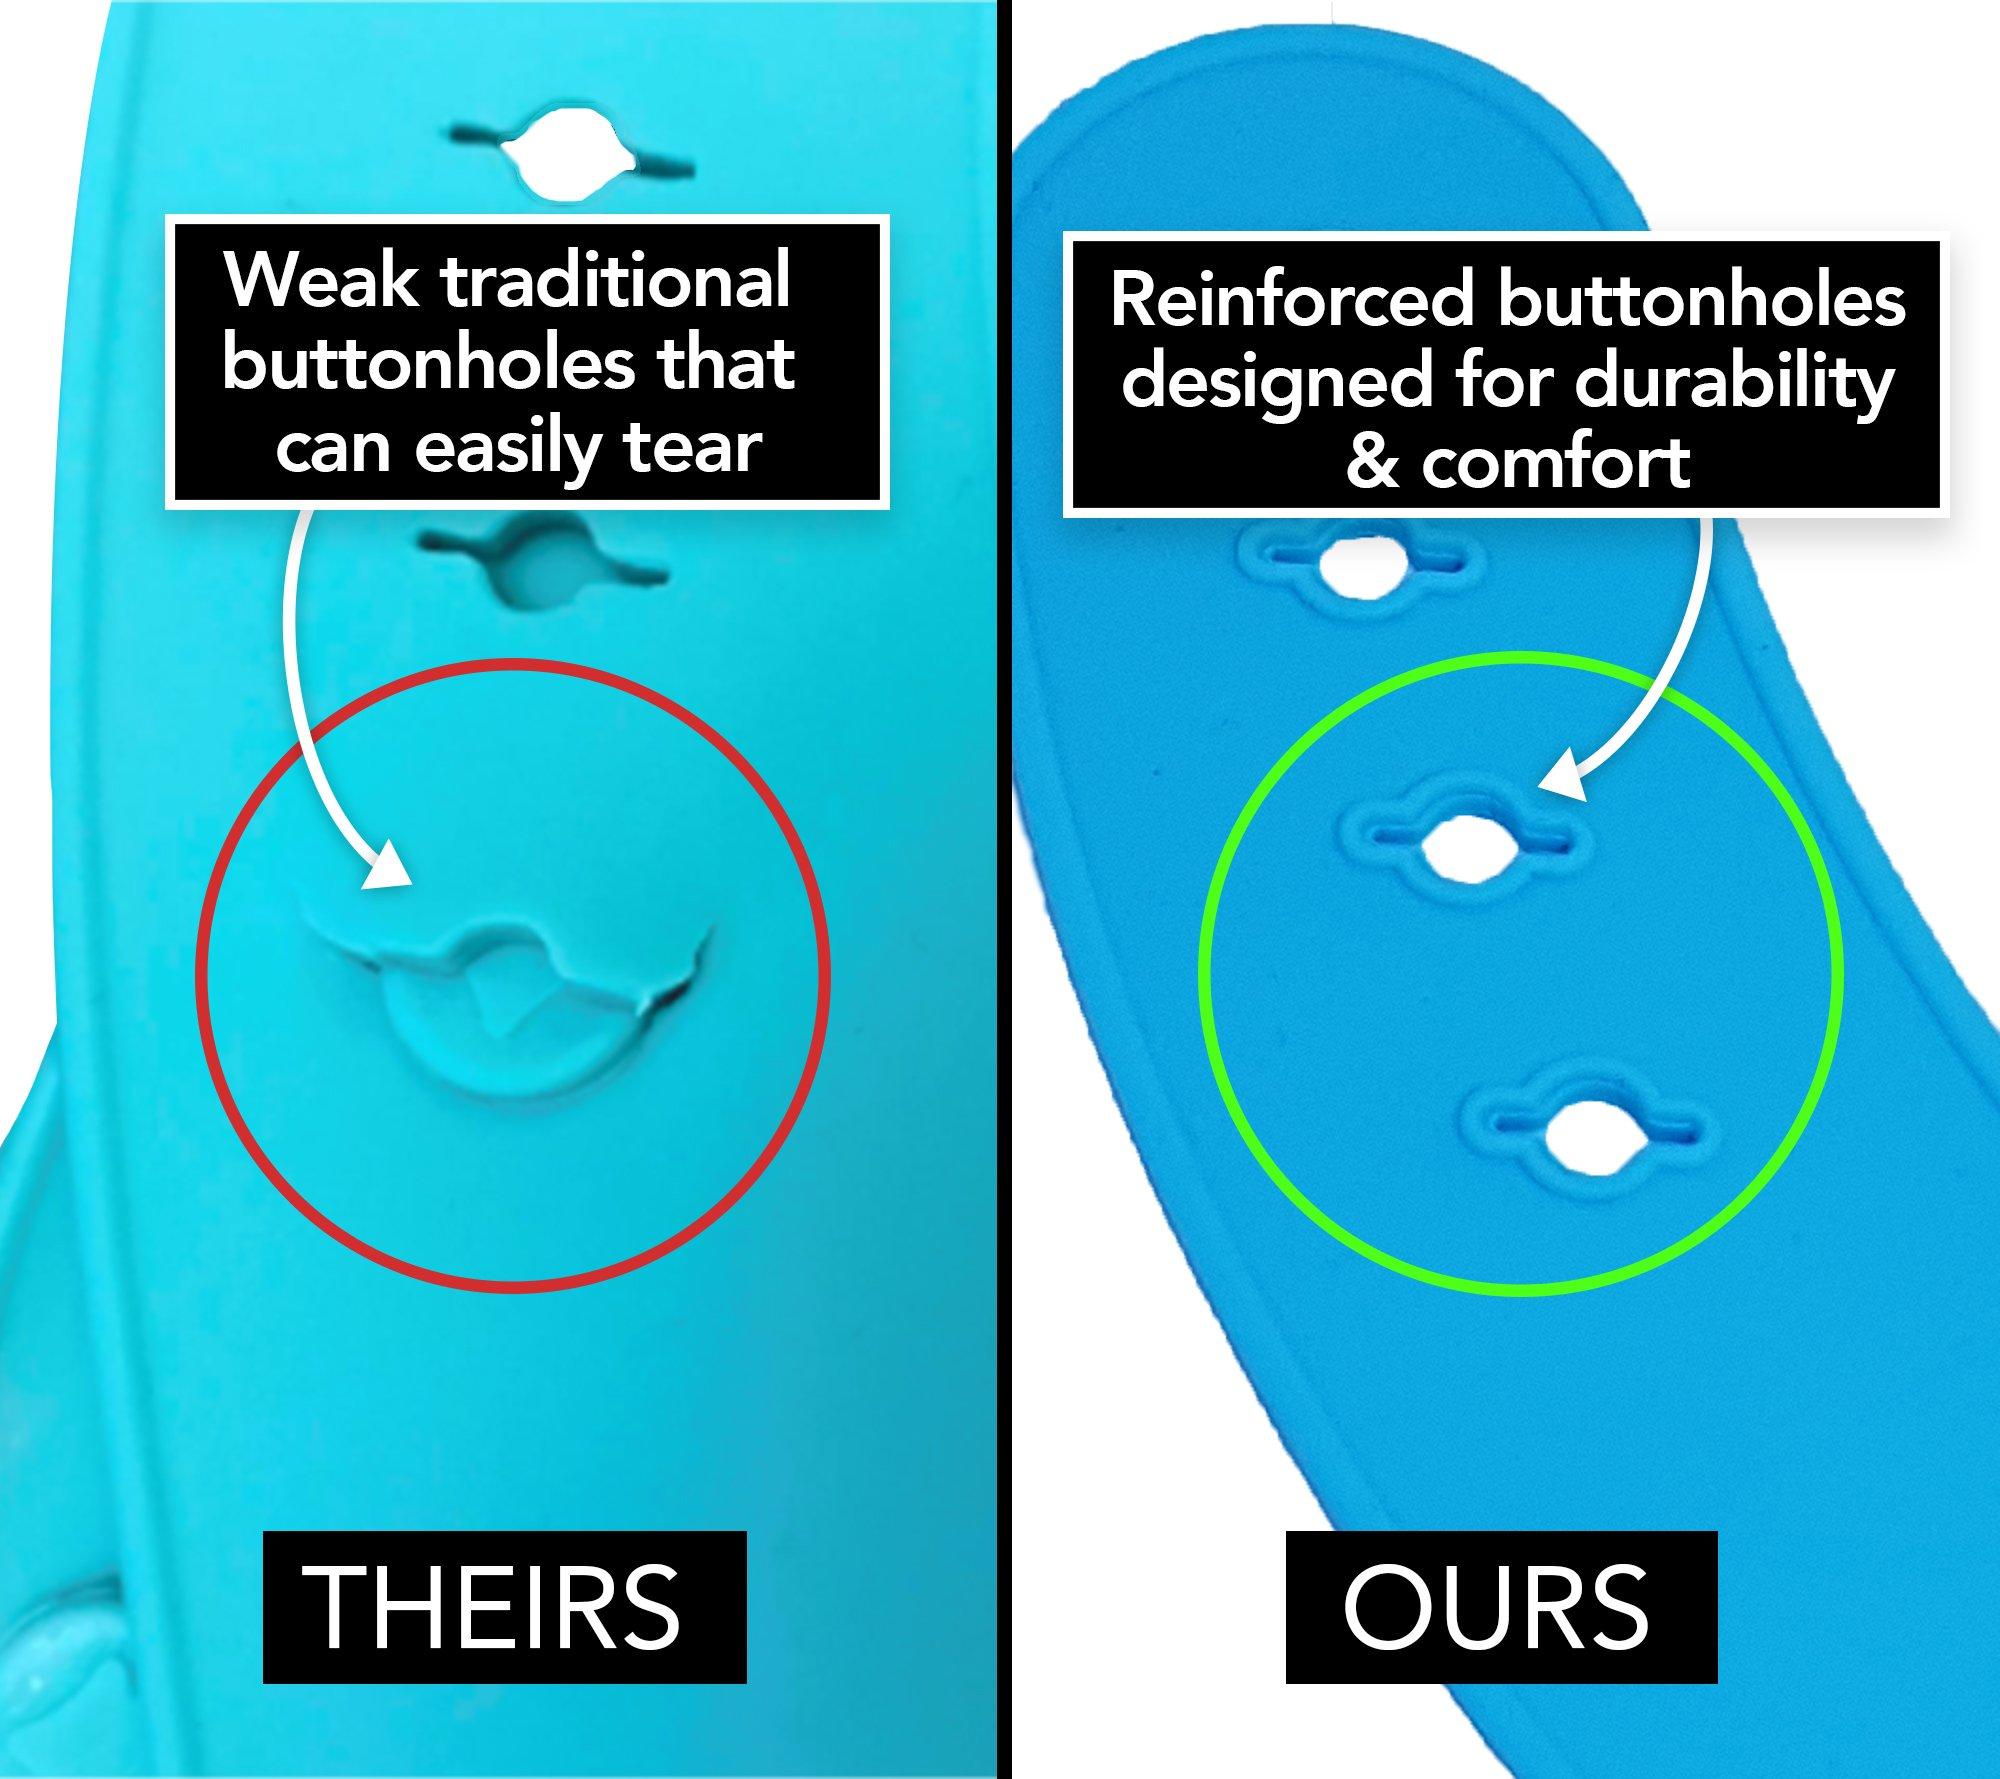 Waterproof Silicone Bibs - 2 PACK (Blue & Green) - PBA Free - Dishwasher Safe - Adjustable Collar (Blue & Green)